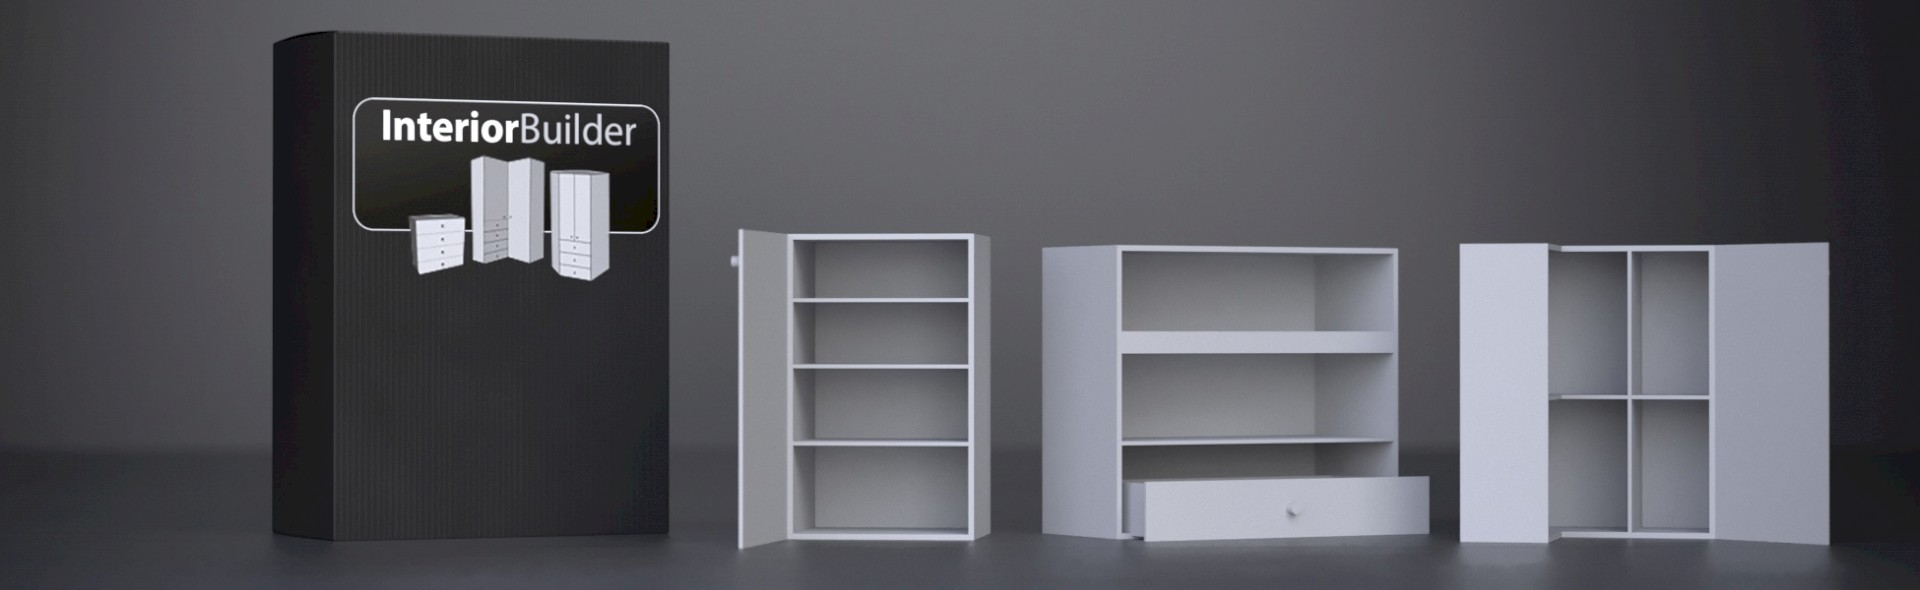 Interior Builder 1 0 2 - Plug-ins - Shop - C4Dzone